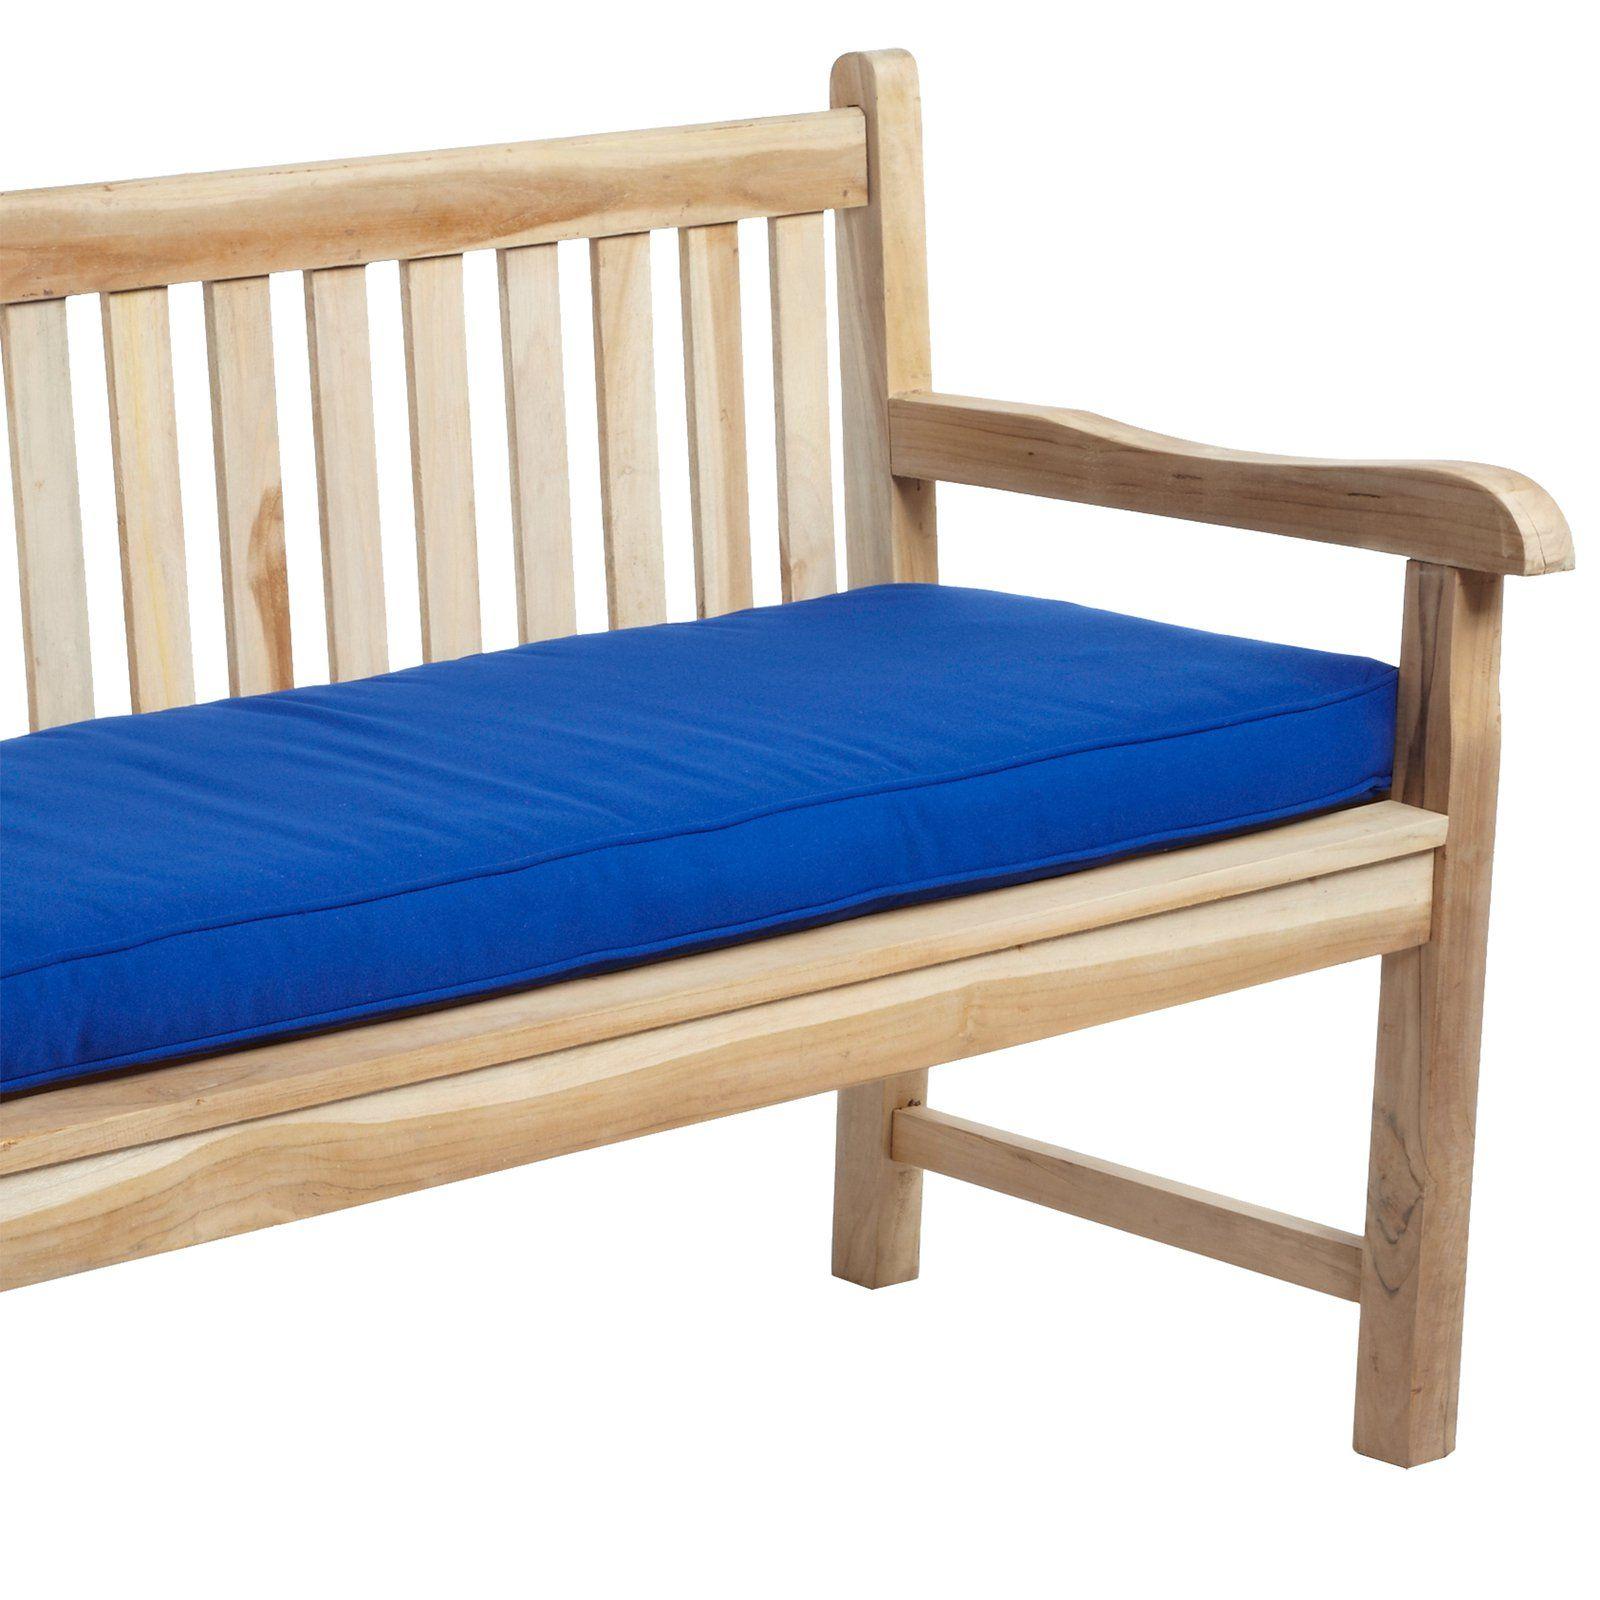 Mozaic Company Veranda Outdoor Bristol Bench Cushion Sunbrella Bench Cushion Bench Cushions Patio Furniture Deals